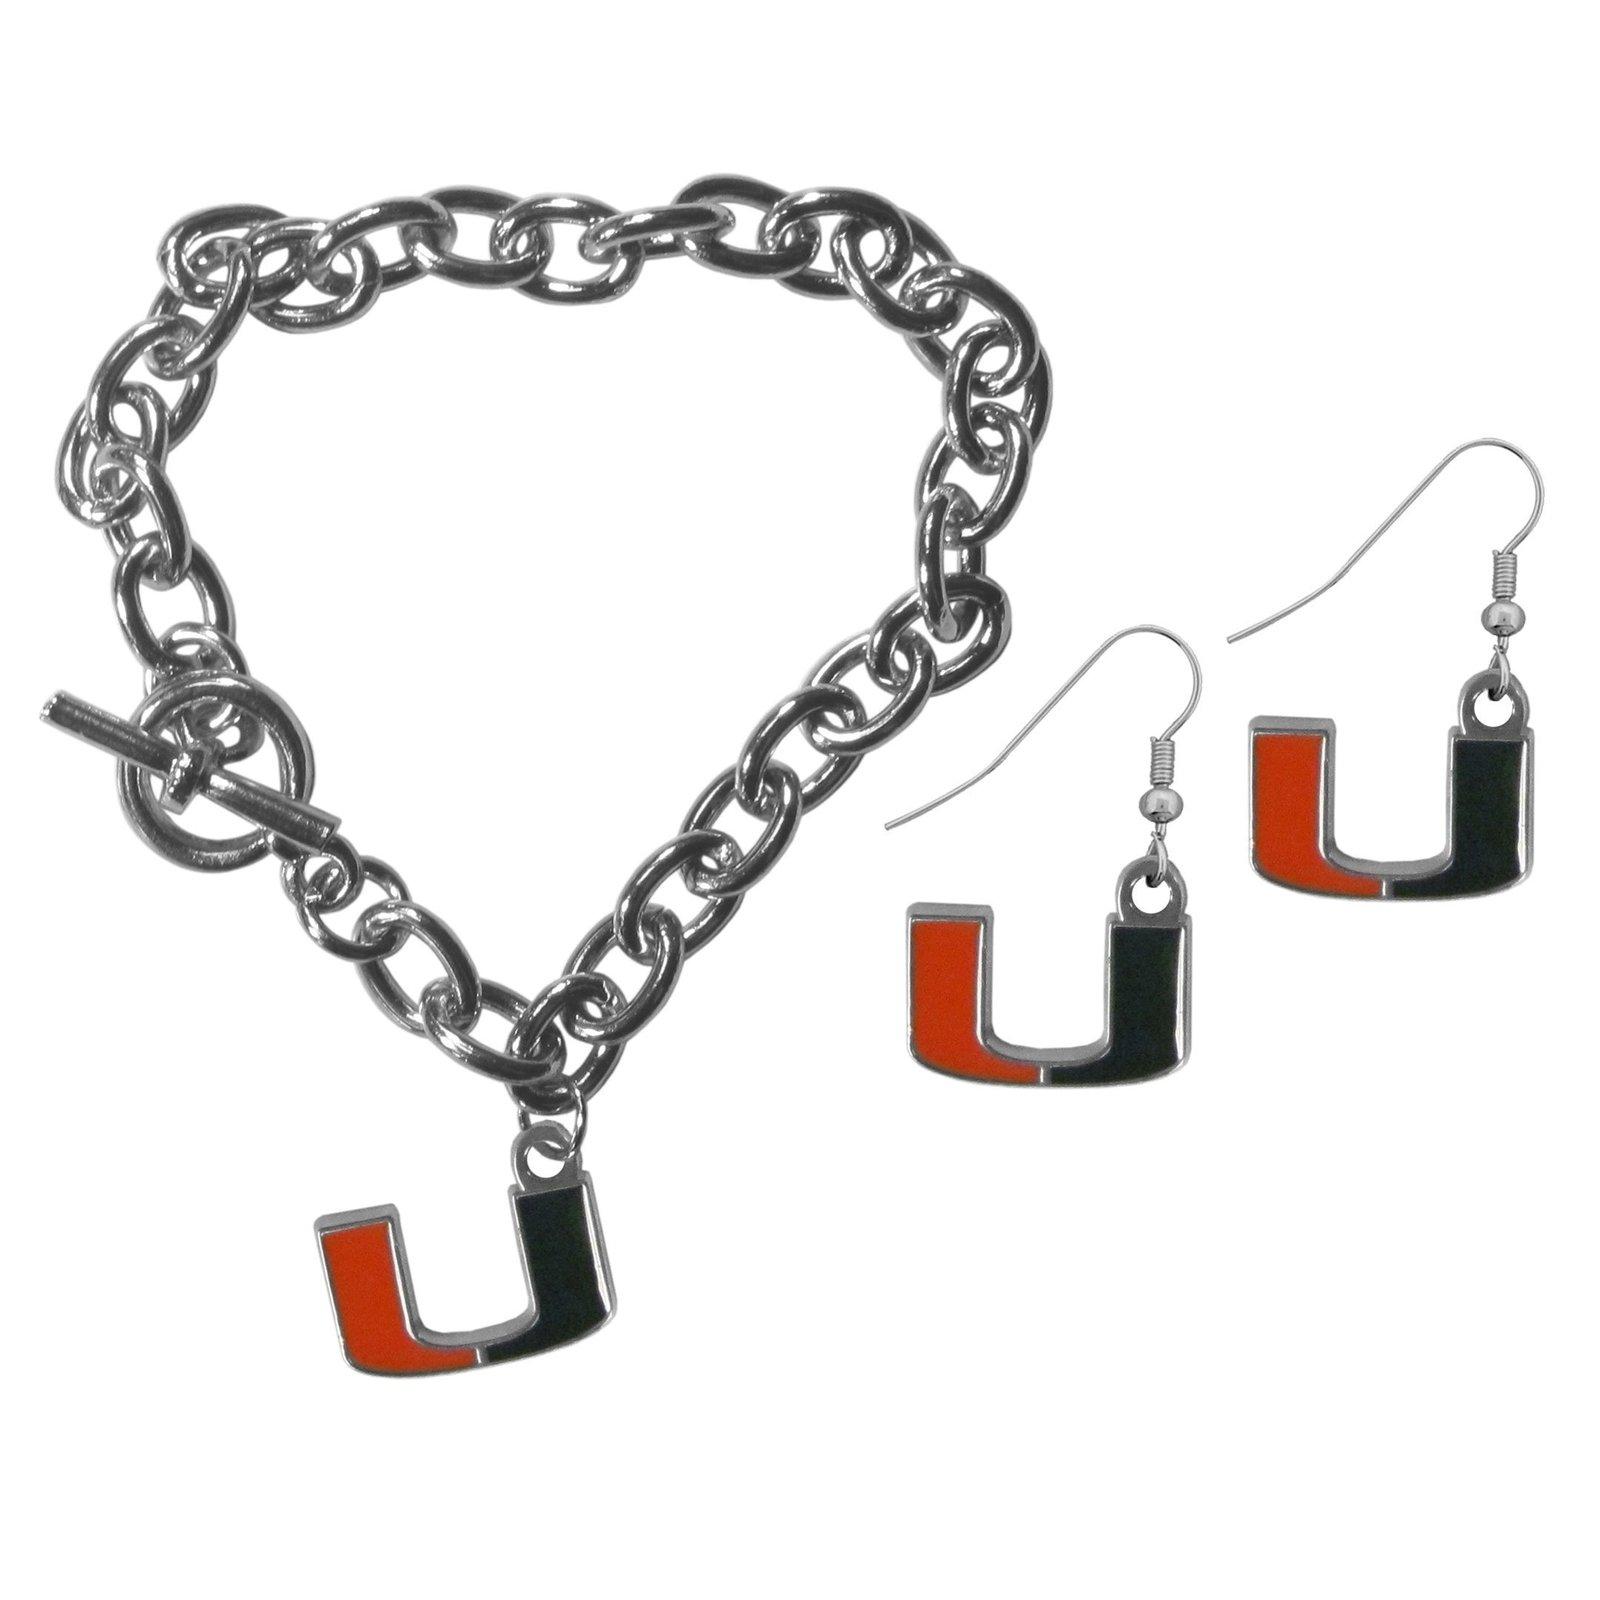 Aa miami hurricanes chain bracelet and dangle earring set default title jademoghul 3656867938408